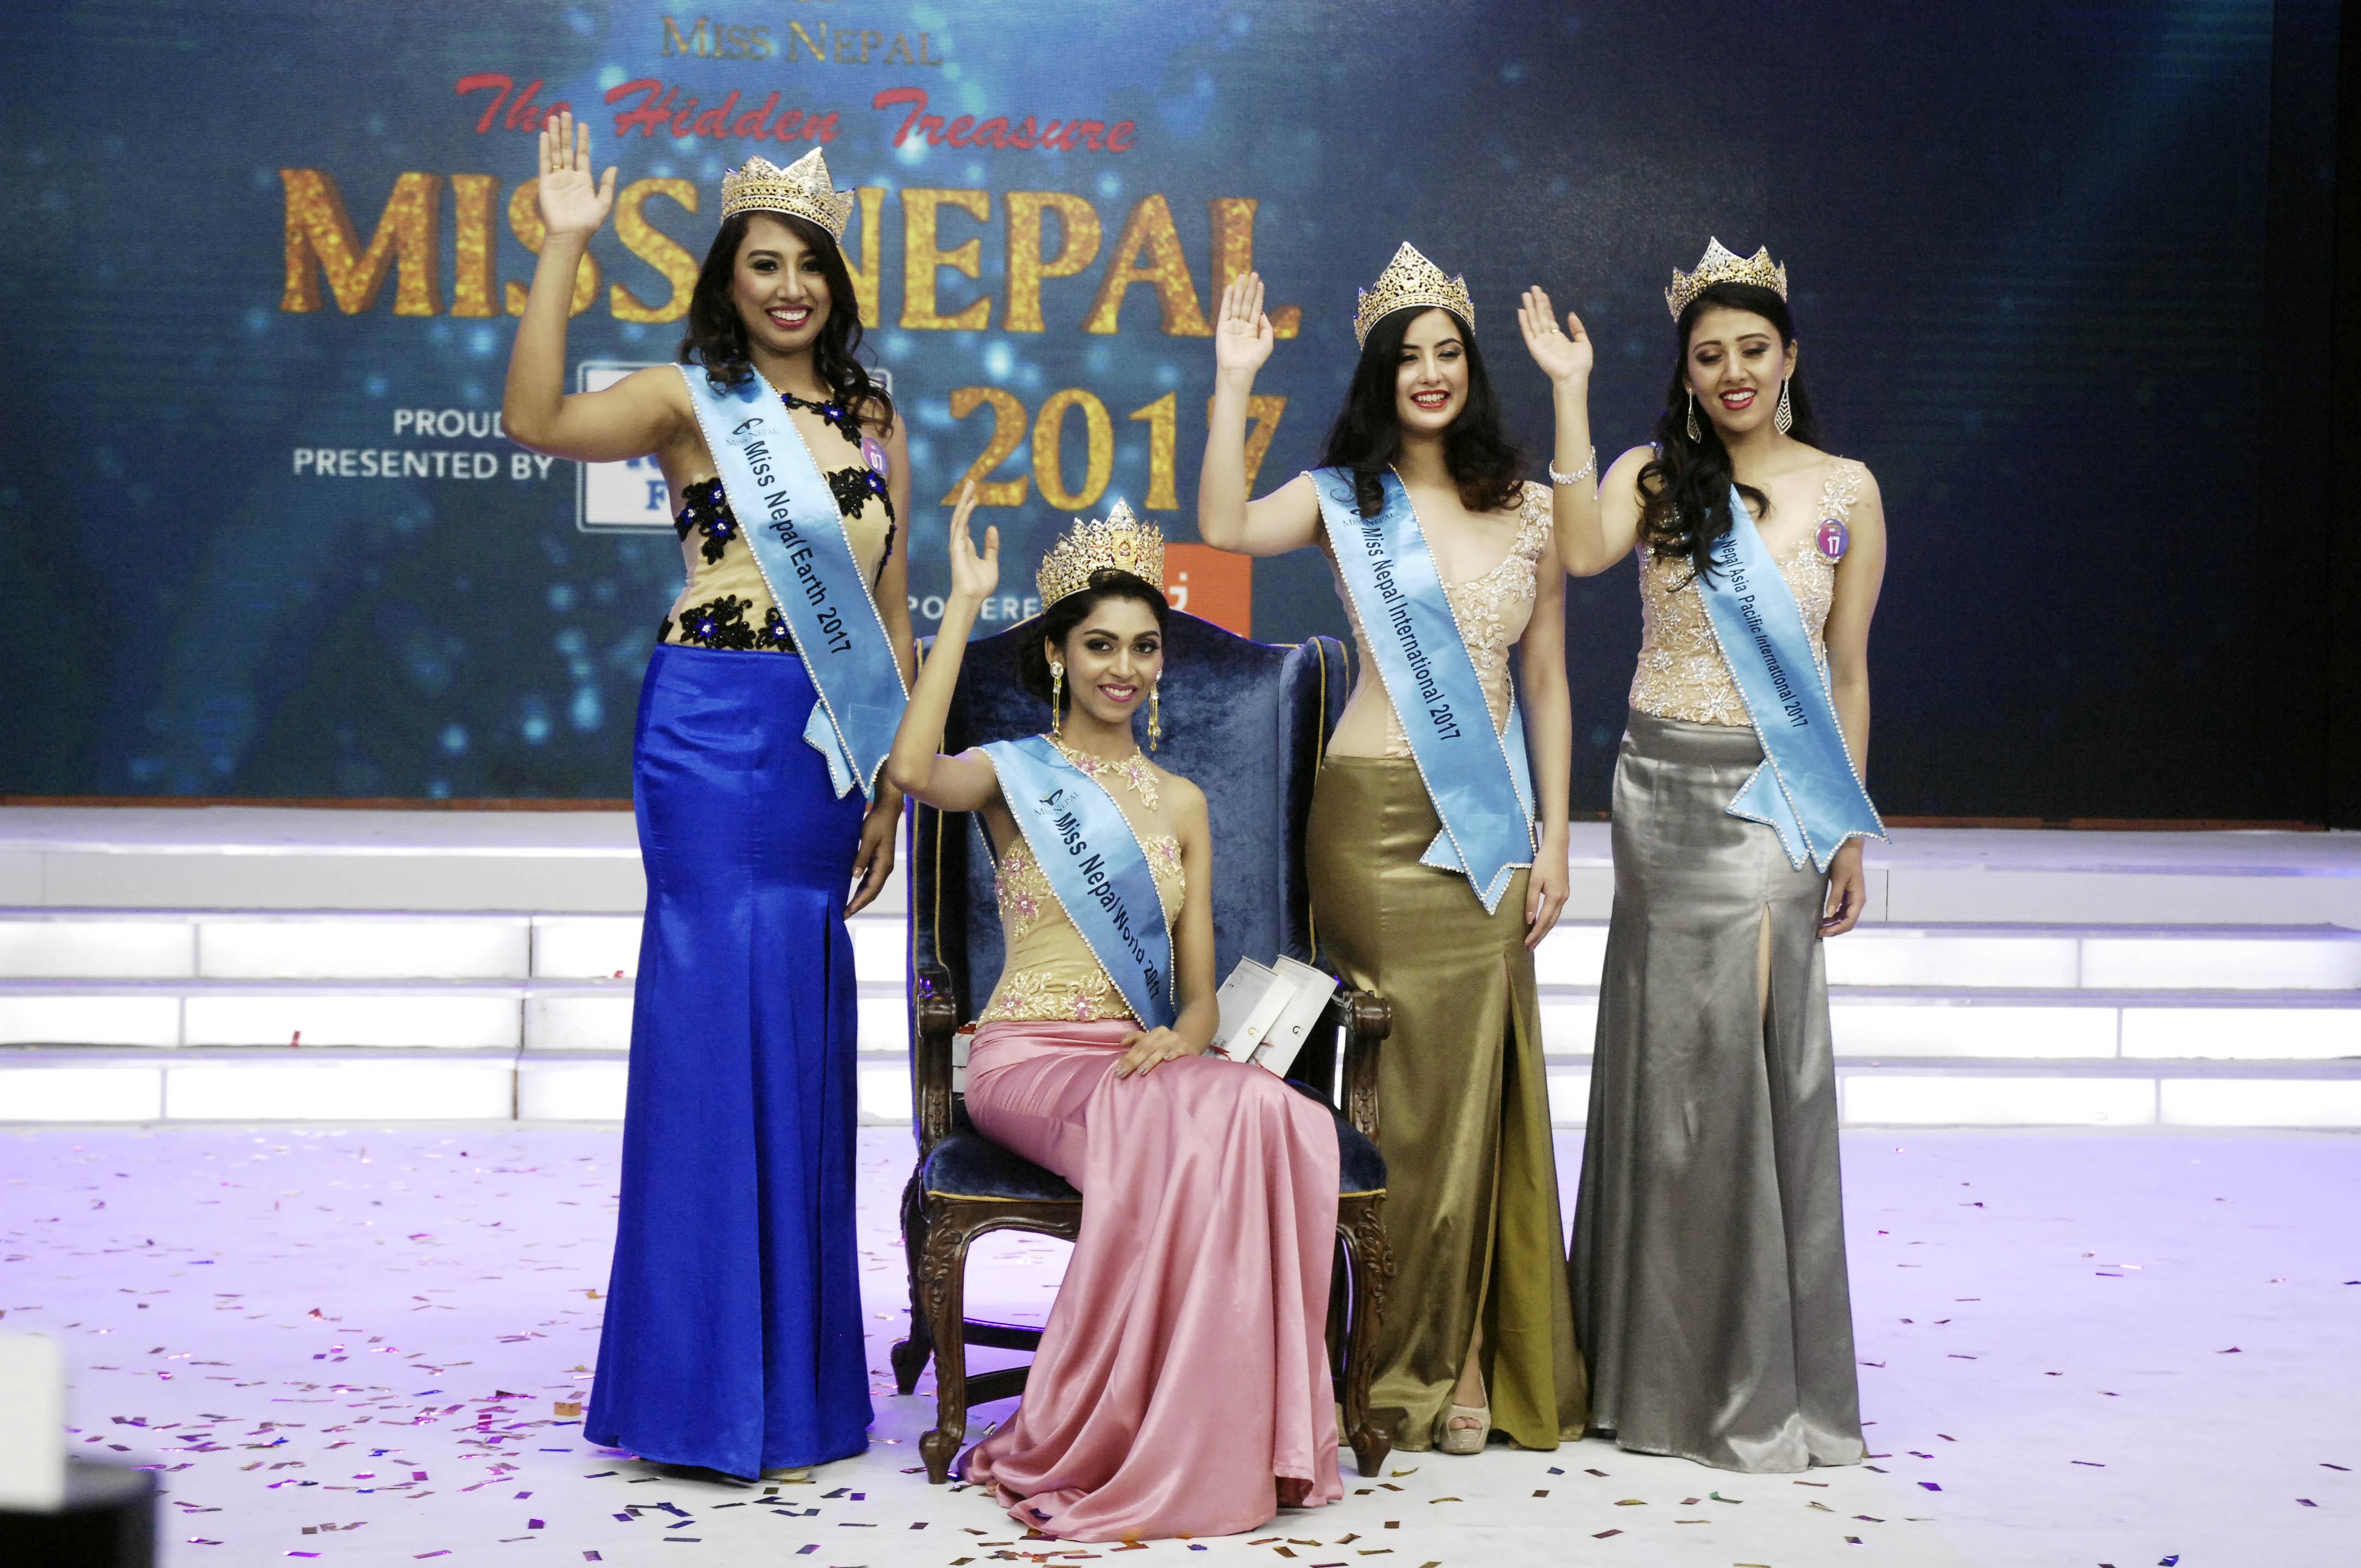 Nikita Chandak (on chair) wins Miss Nepal World 2017 crown, (from left) Rojina Shrestha wins Miss Nepal Earth,  Niti Shah wins Miss Nepal International while Sahara Basnet wins Miss Nepal Asia Pacific at an event held at Hotel Annapurna, Durbar Marg on Friday, June 2, 2017. Photo: Naresh Shrestha/THT